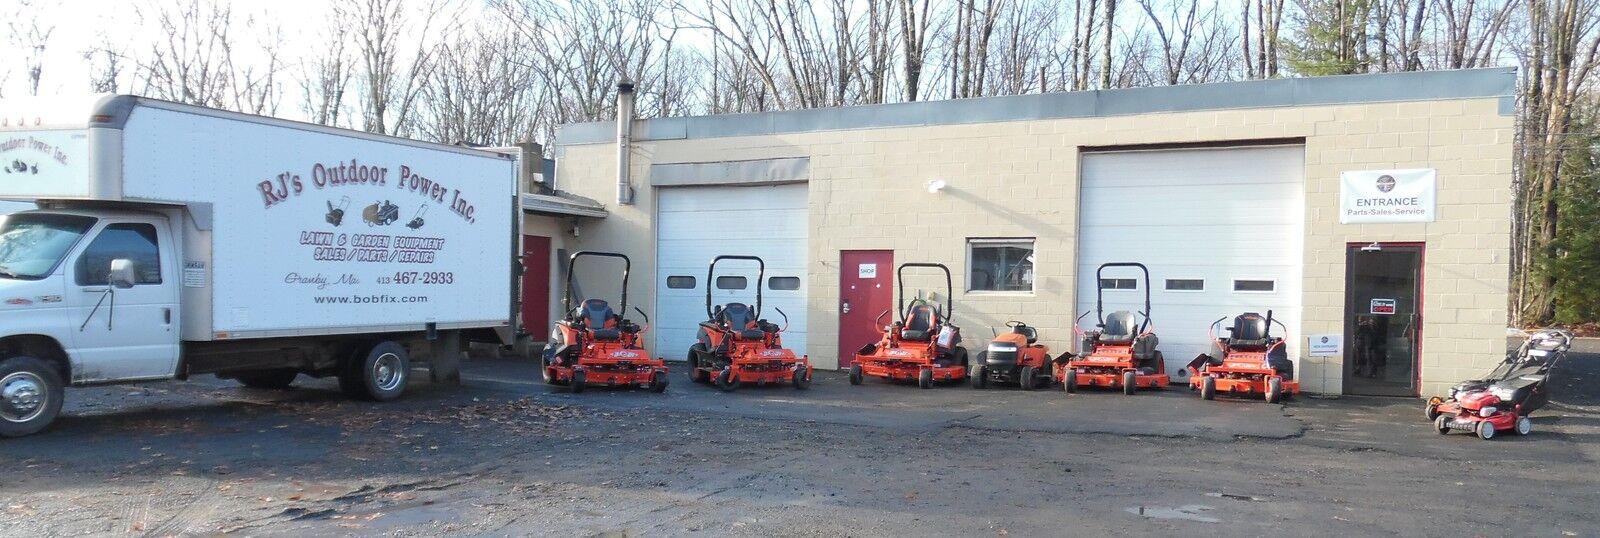 RJ s Outdoor Power Inc